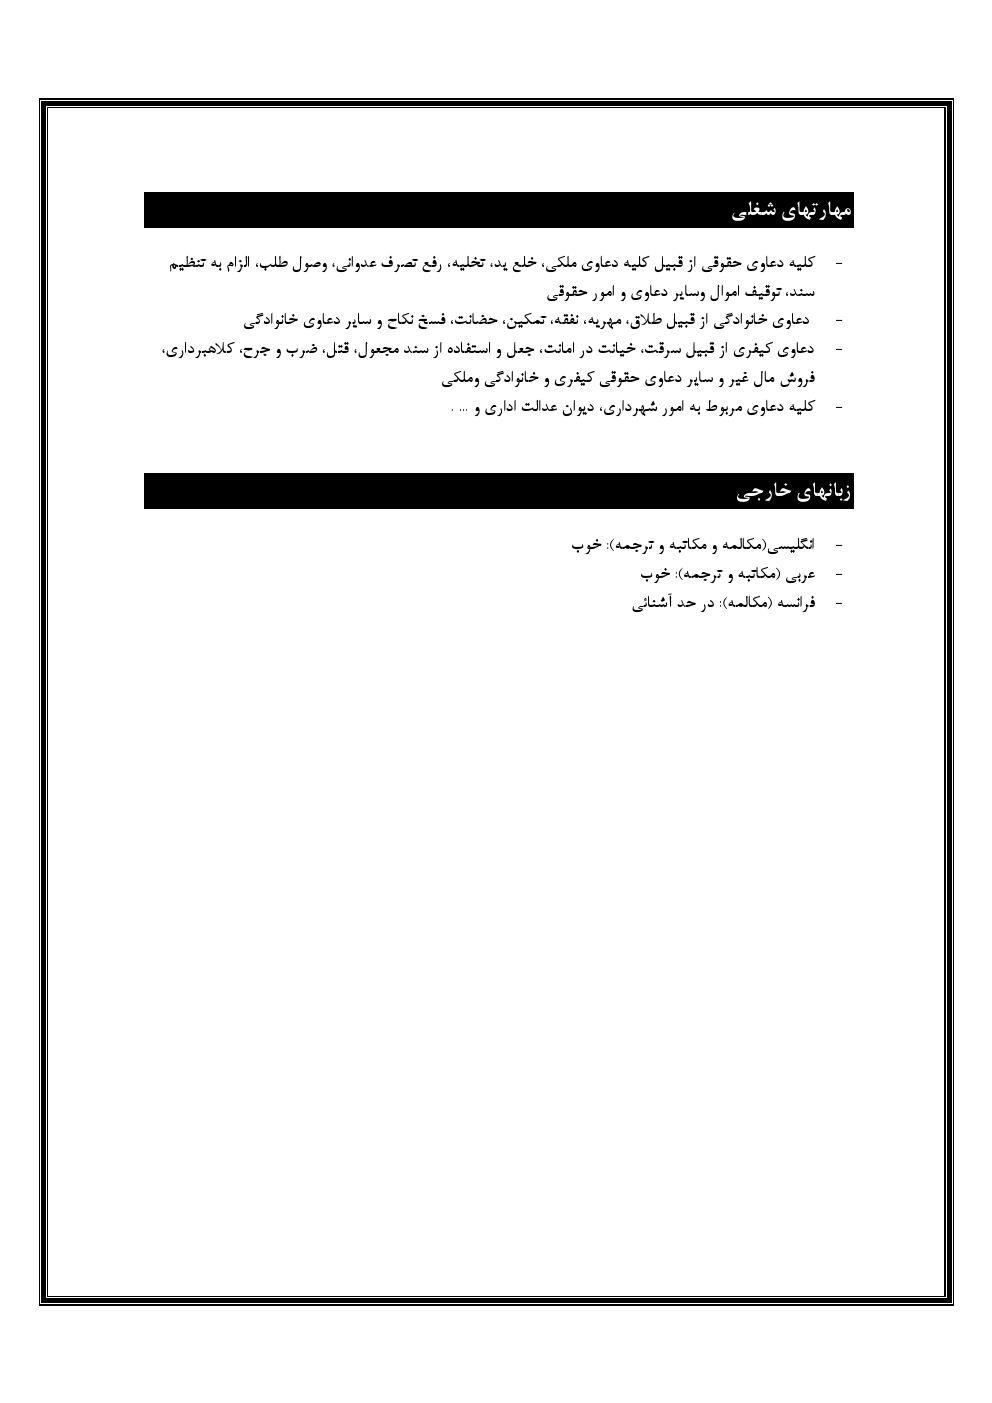 Resume farsi Reza 2 3 - معرفی